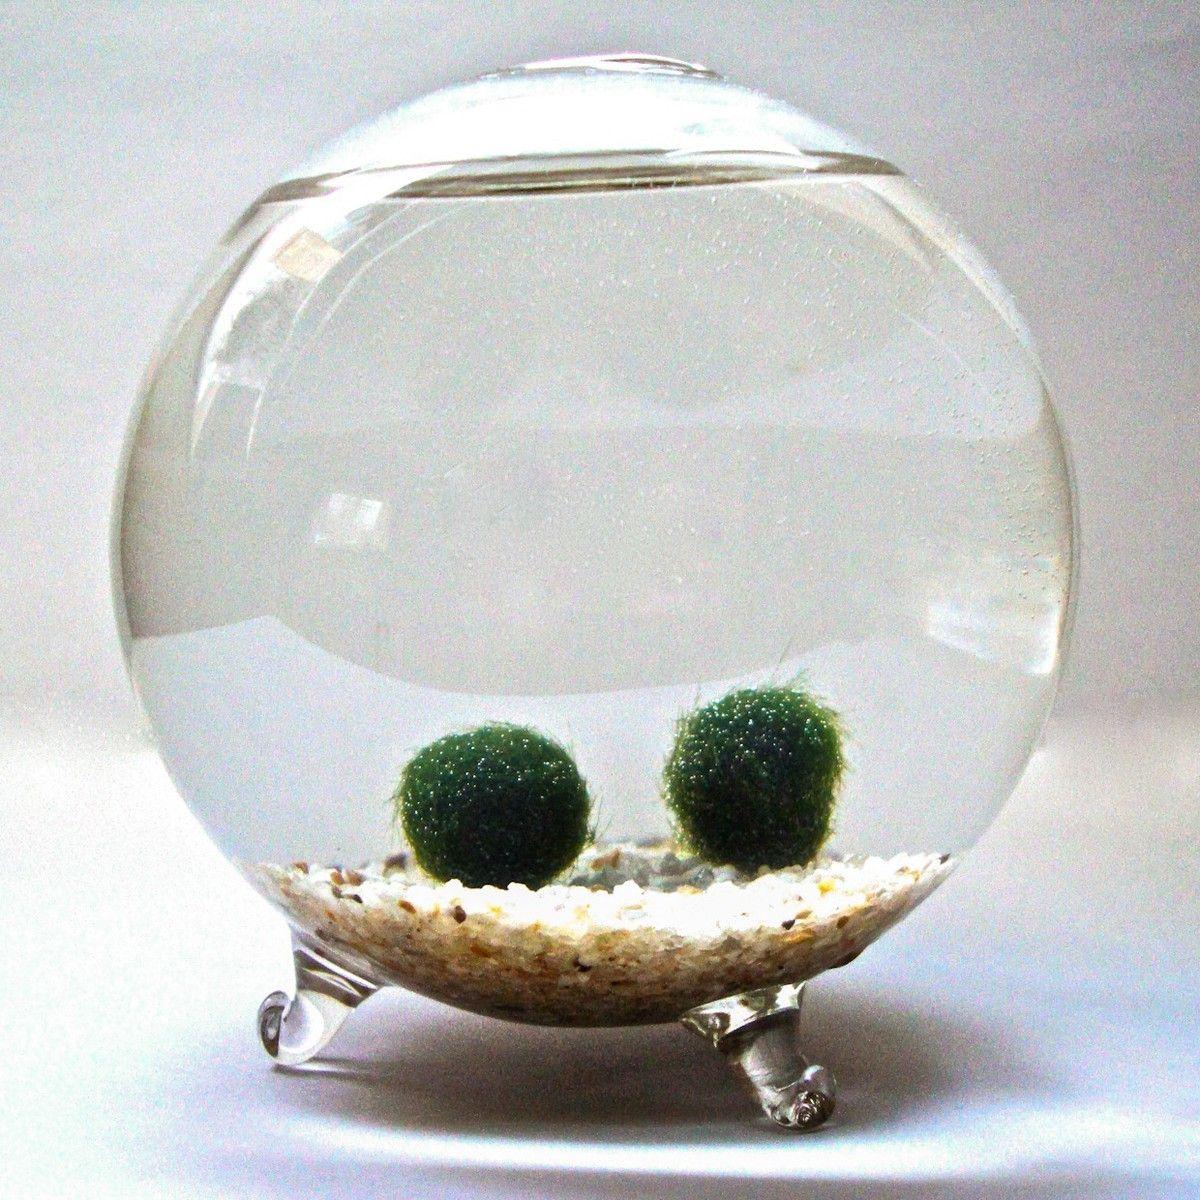 Moss Balls In A Water Terrarium Delightful Marimo